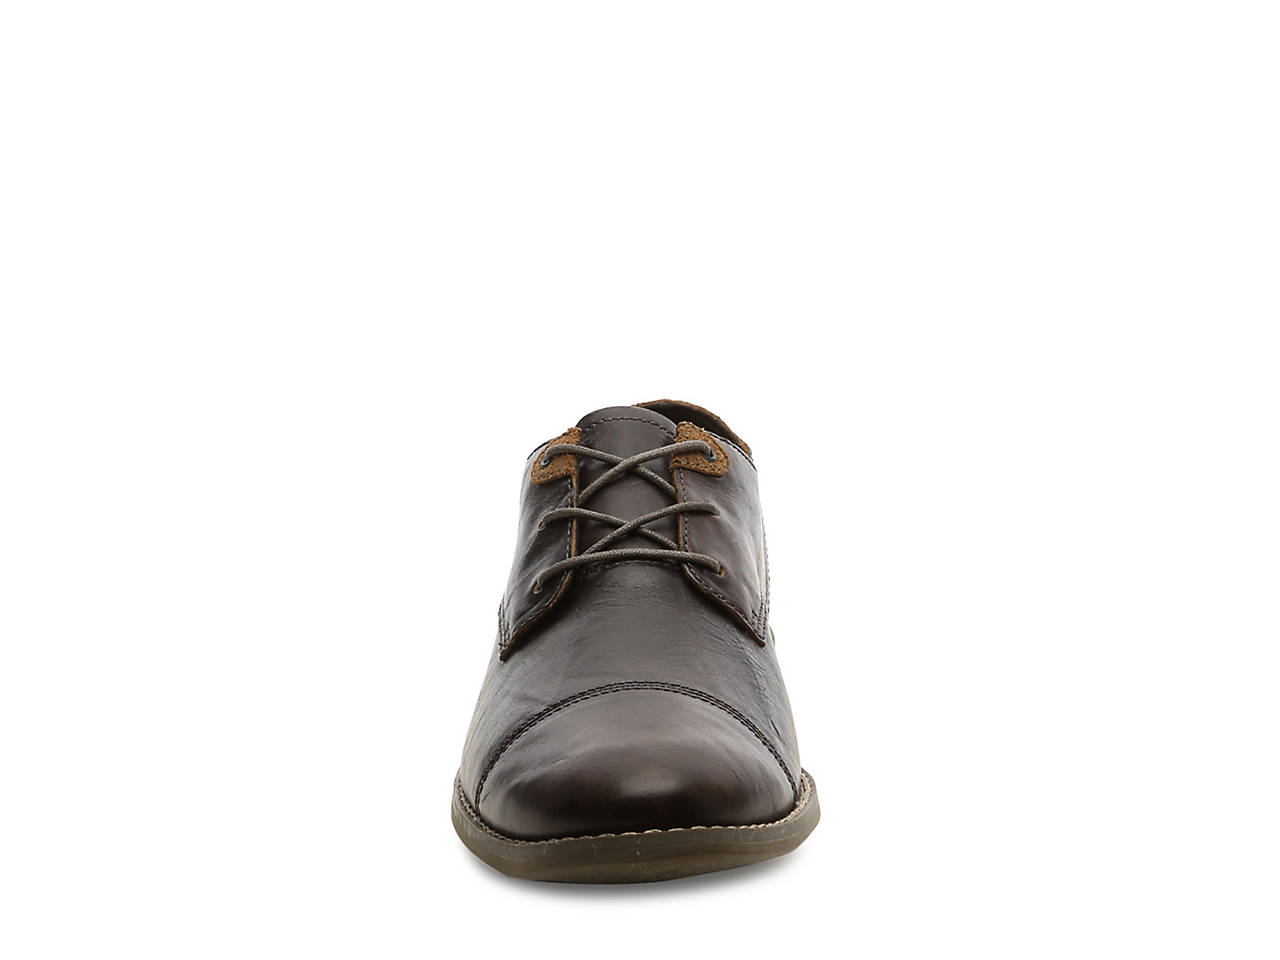 Timberland Revenia Cap Toe Oxford Men S Shoes Dsw